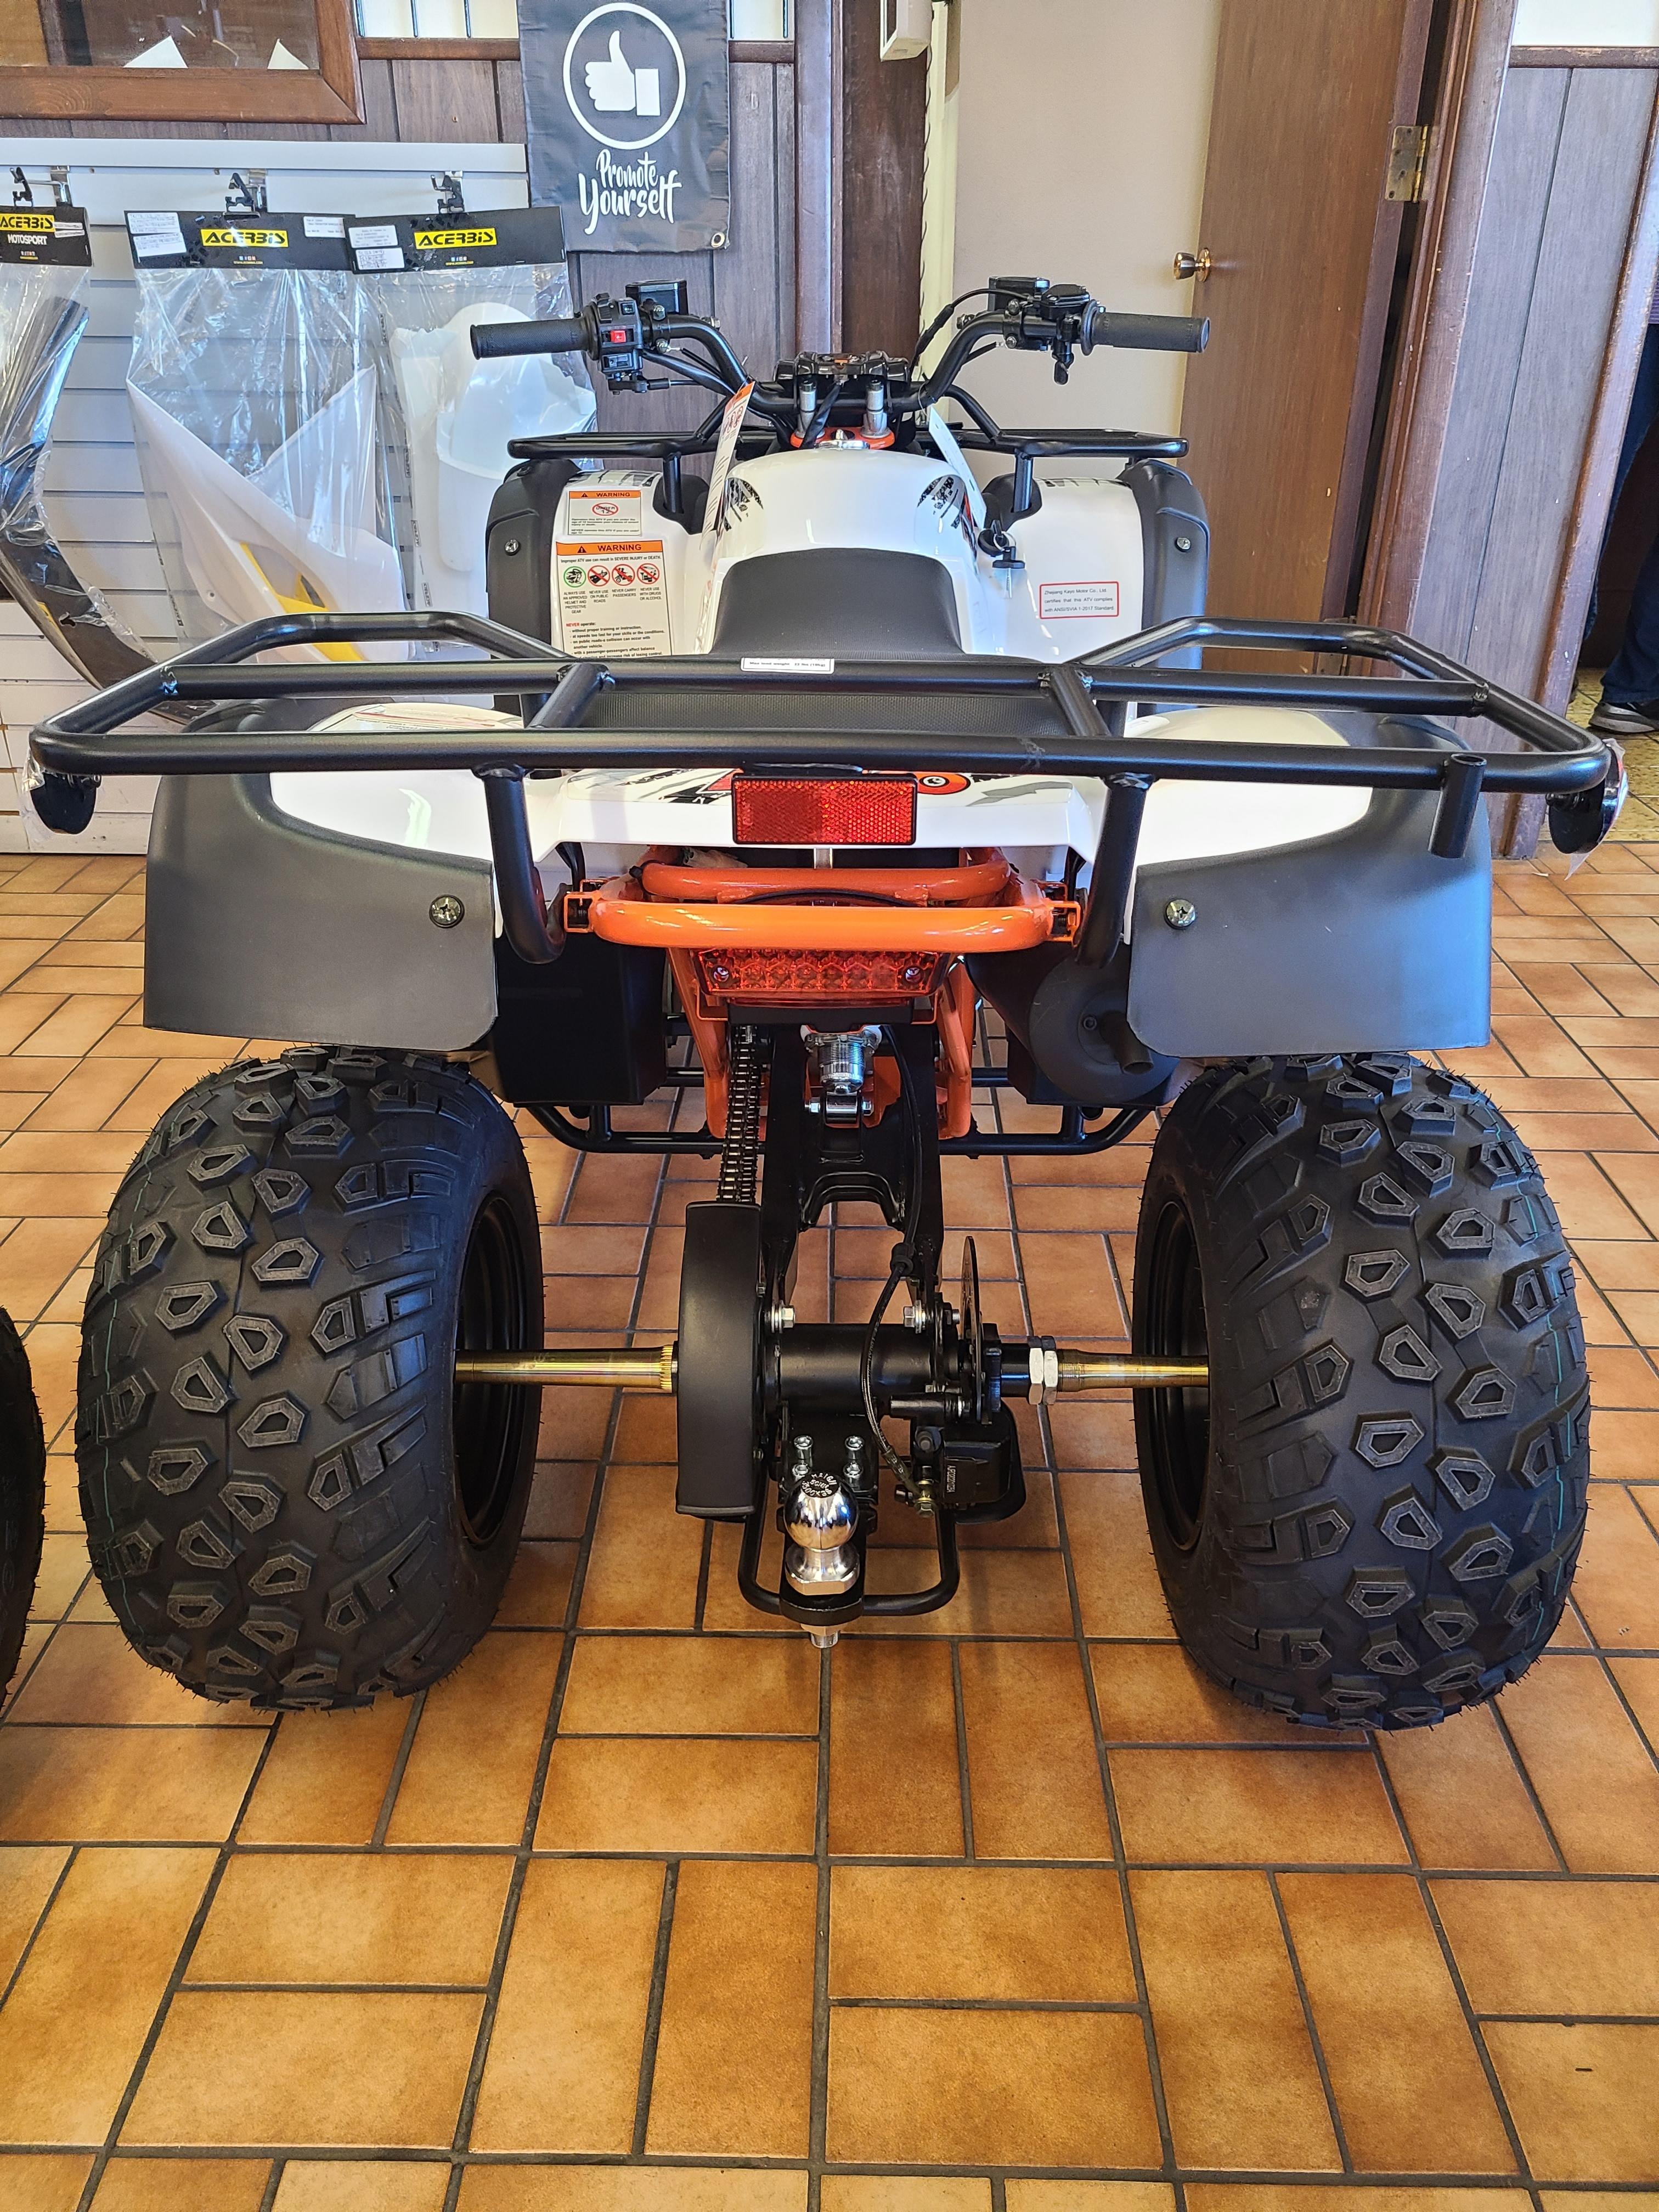 2021 Kayo BULL 150 at Bobby J's Yamaha, Albuquerque, NM 87110